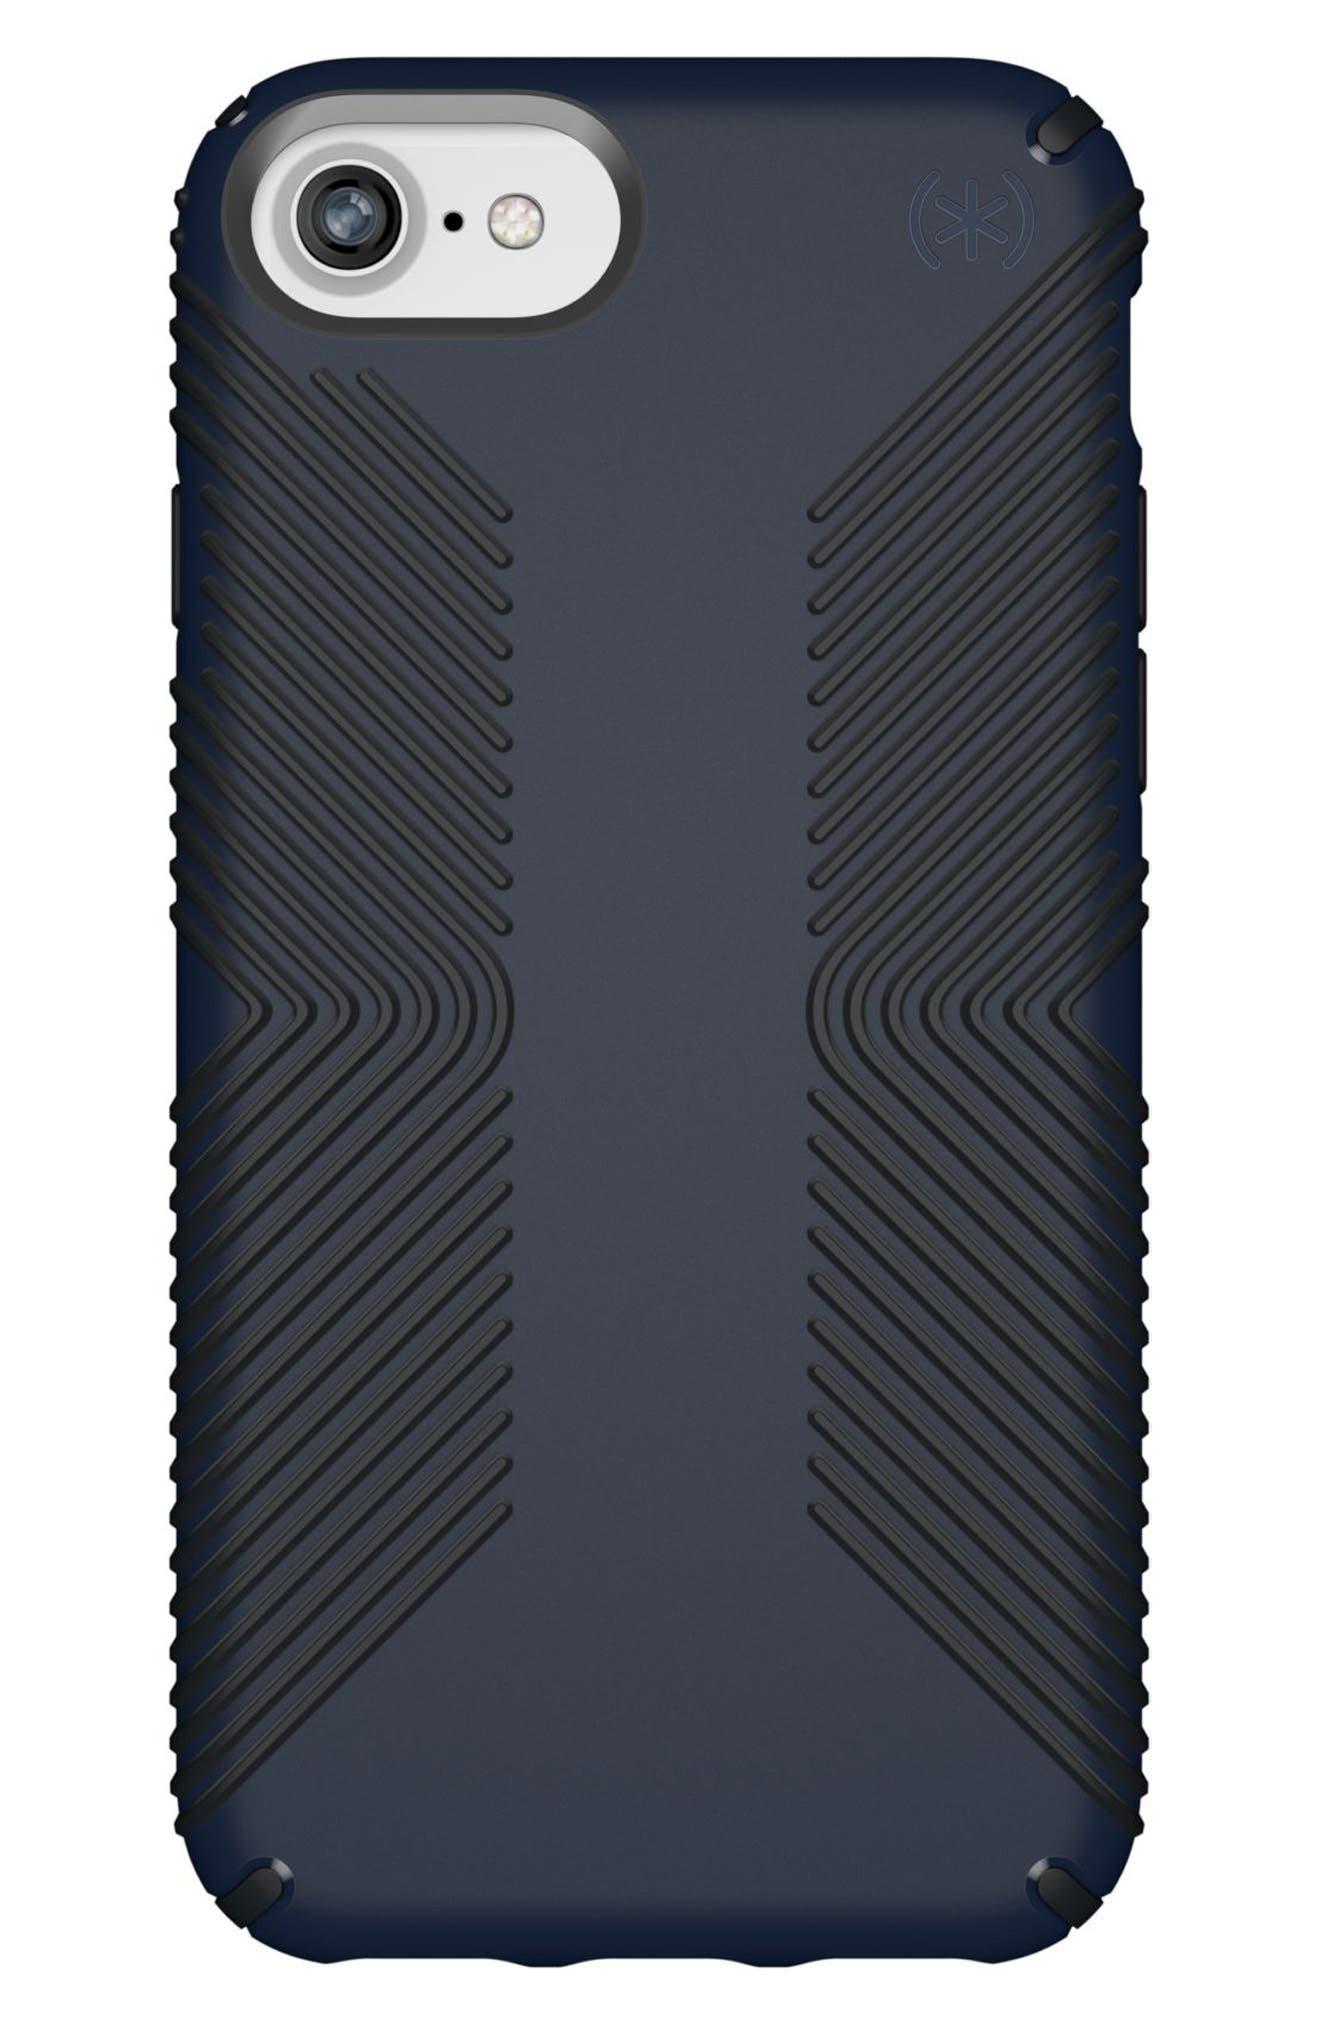 Grip iPhone 6/6s/7/8 Case,                         Main,                         color, 400